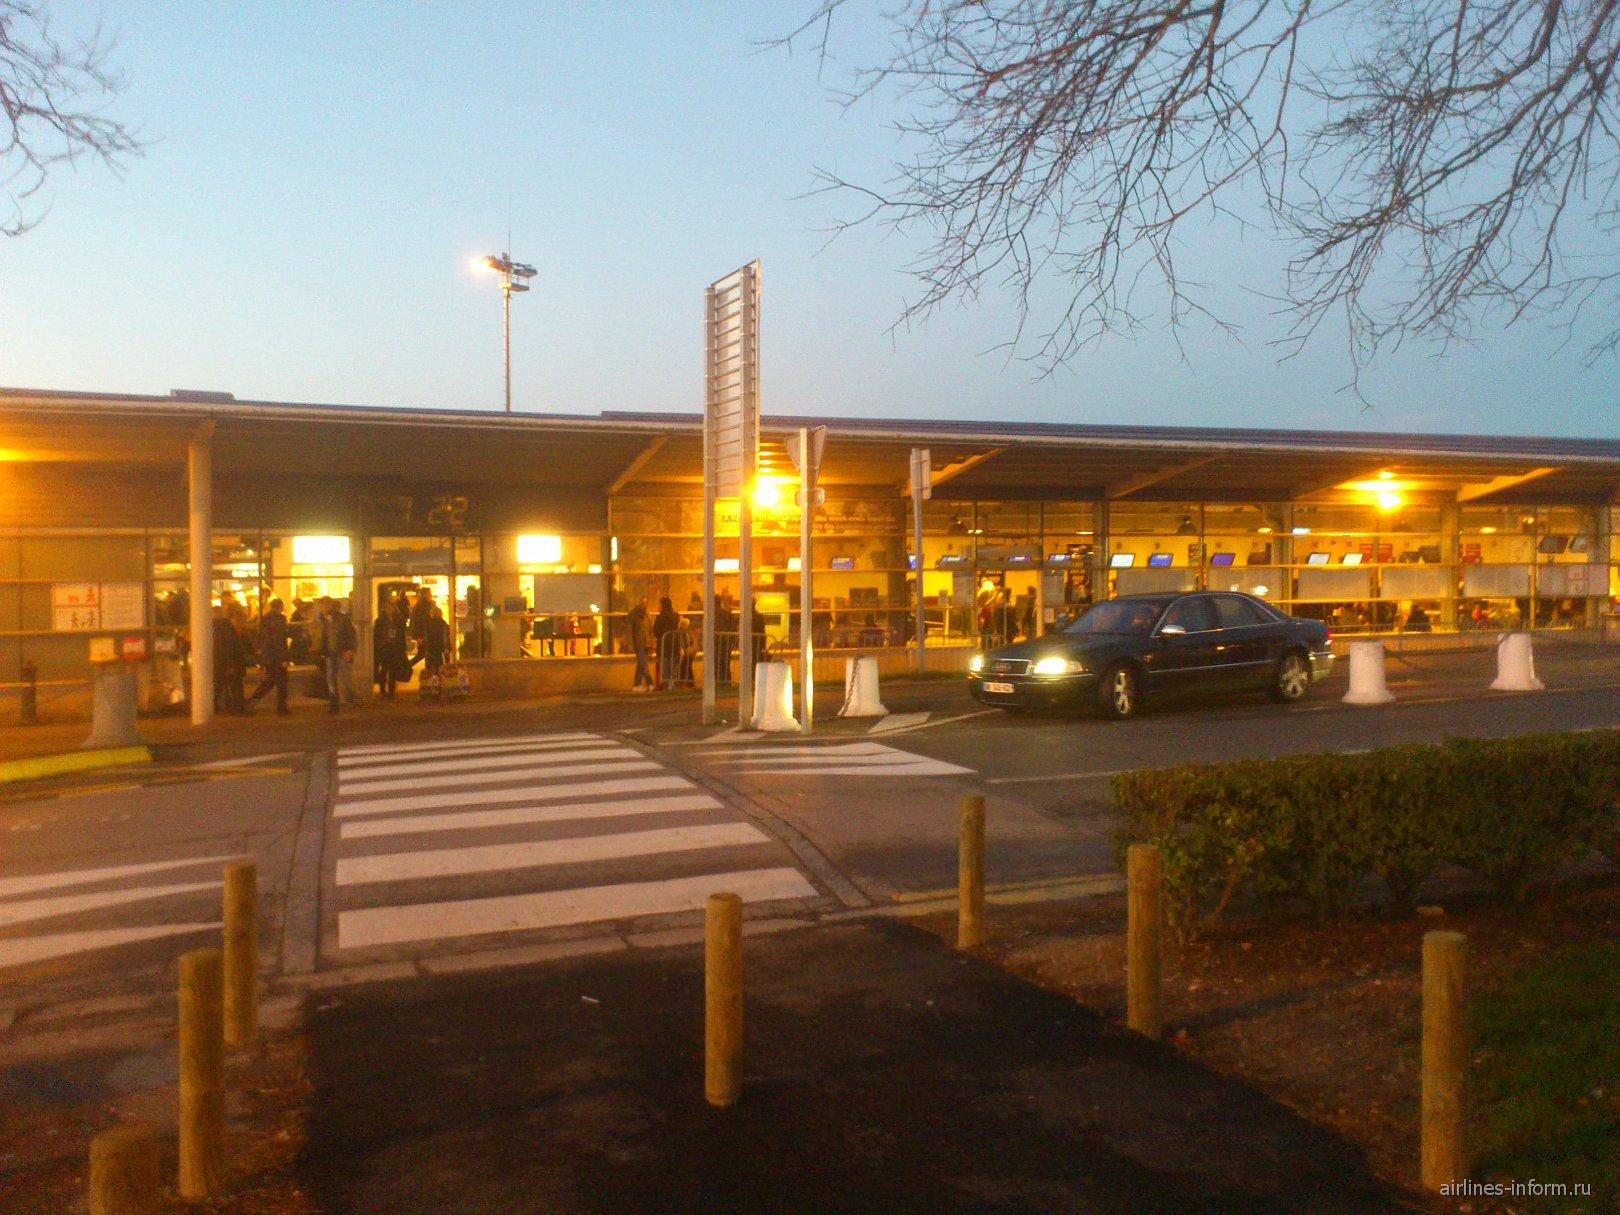 Терминал 1 аэропорта Париж Бове